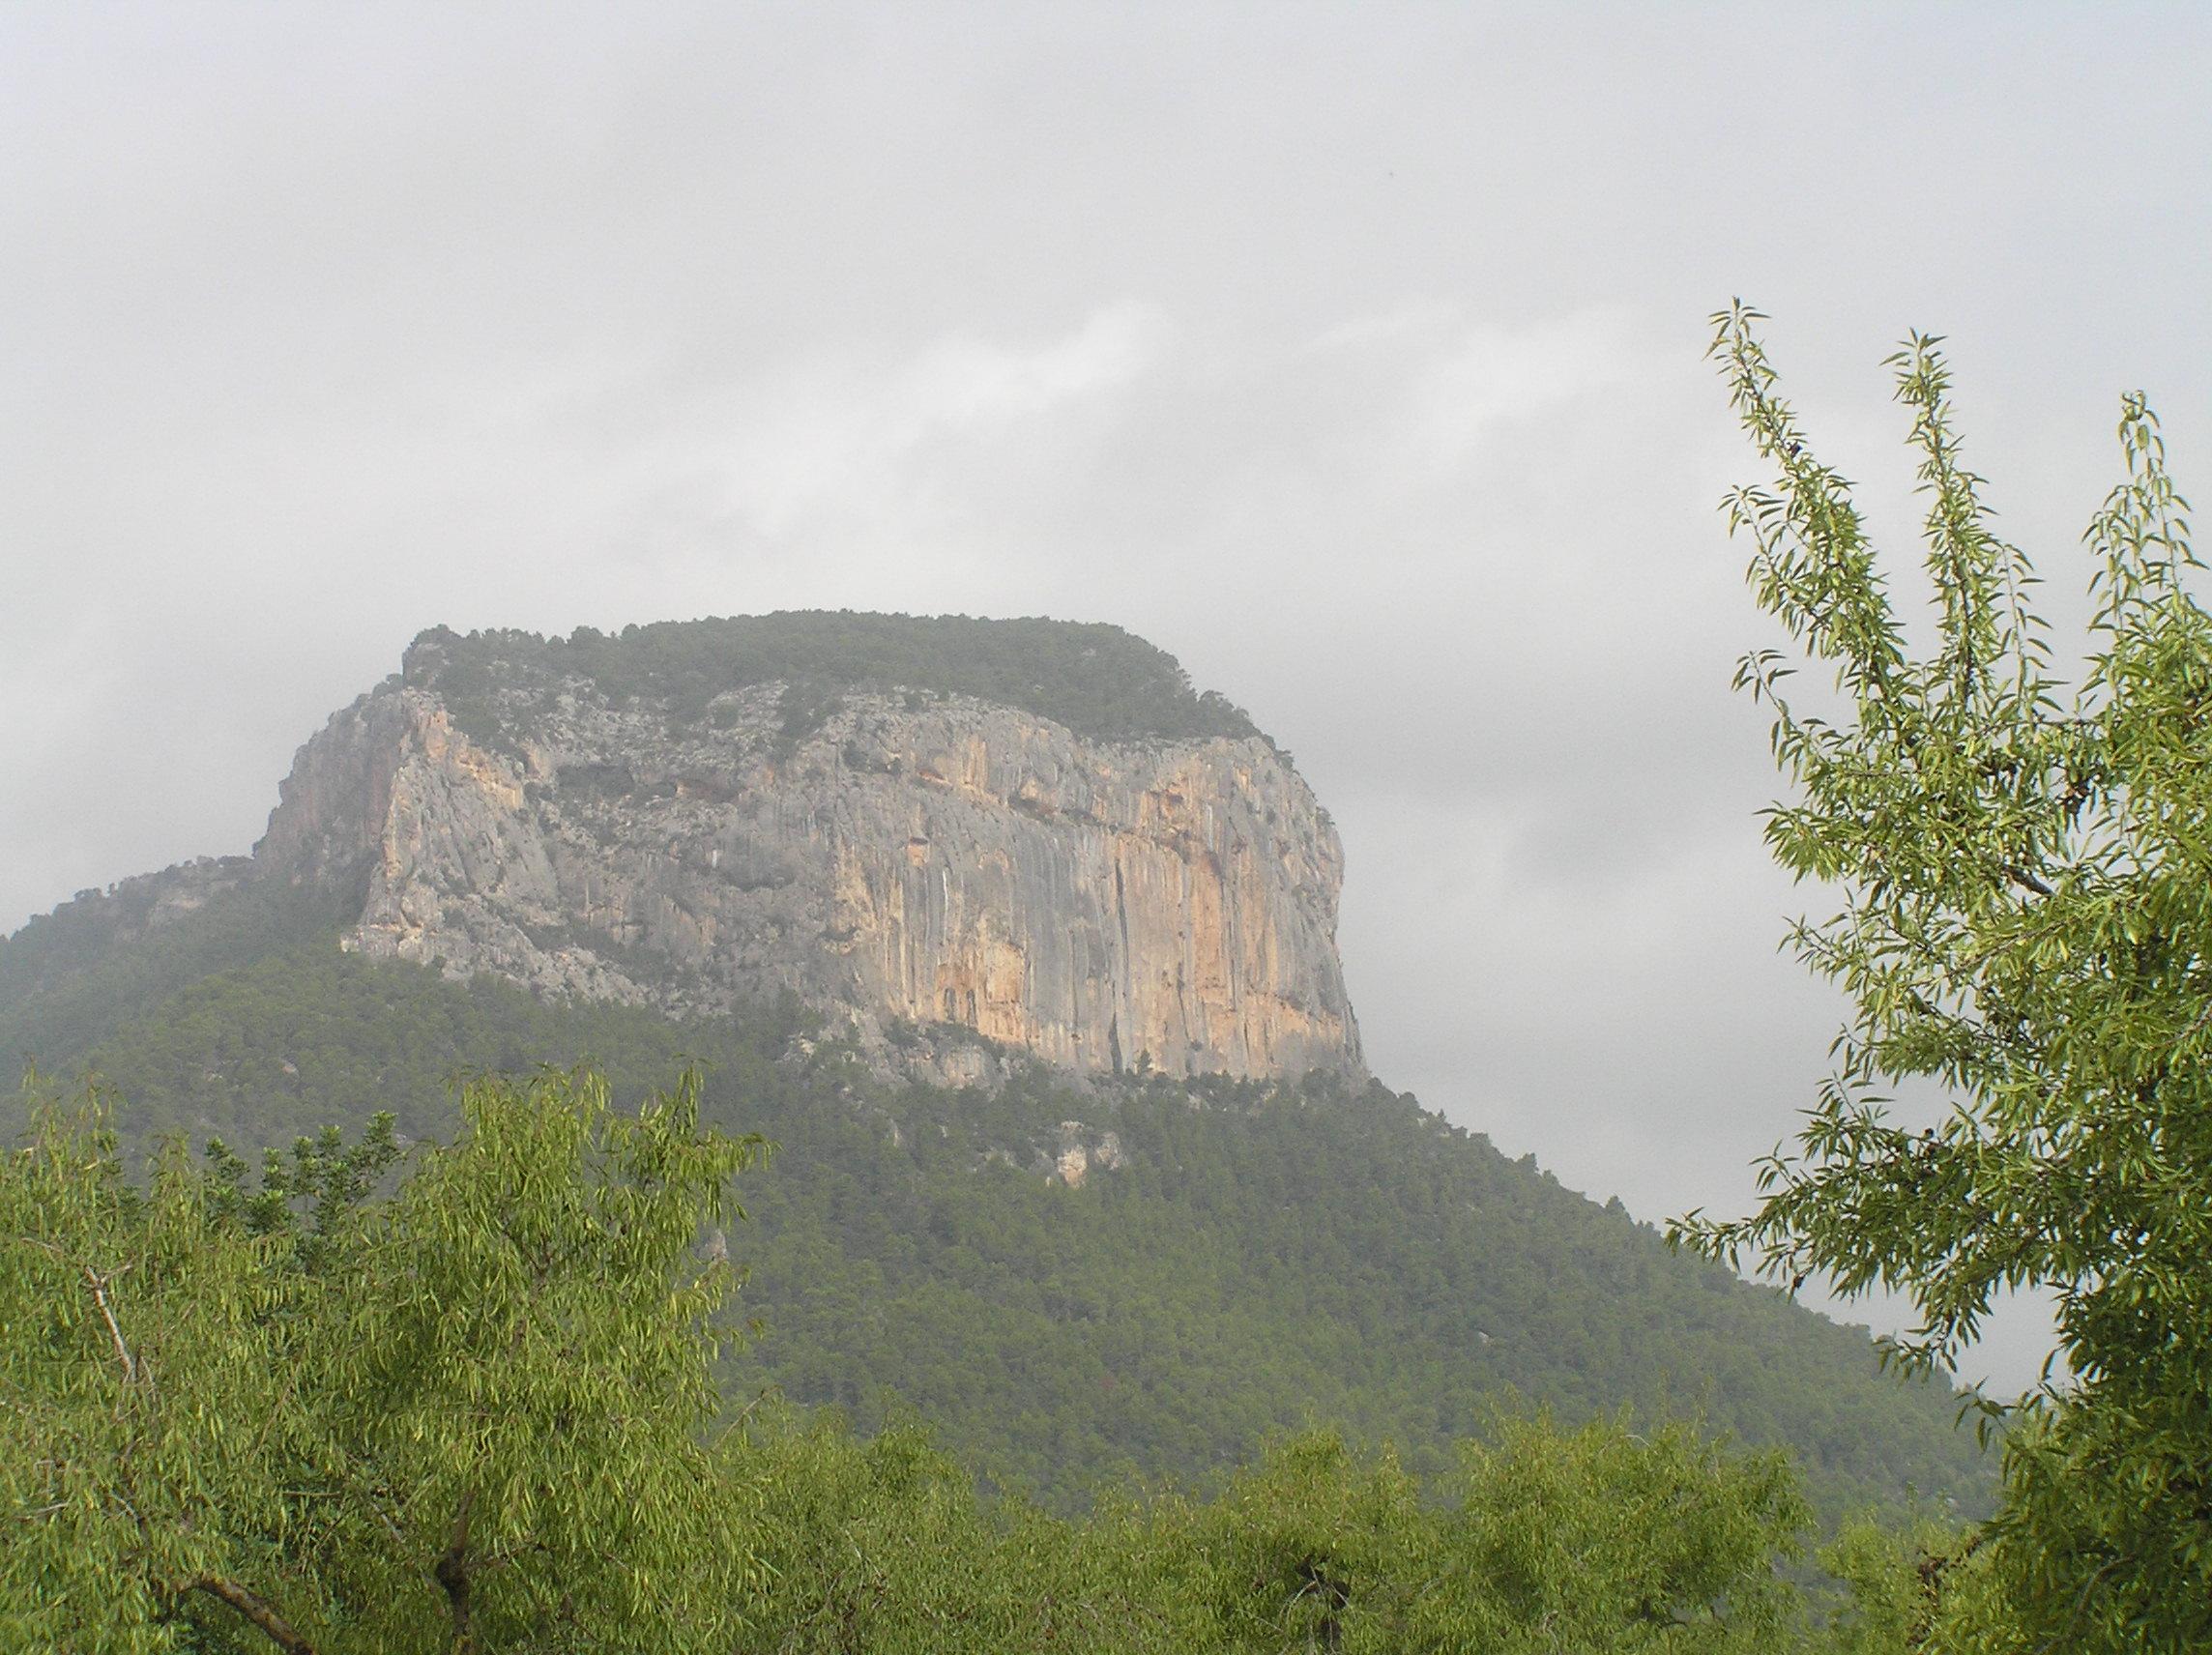 Diario de un montañero Paparazzi: Castell de Alaró: Sierra de Tramuntana